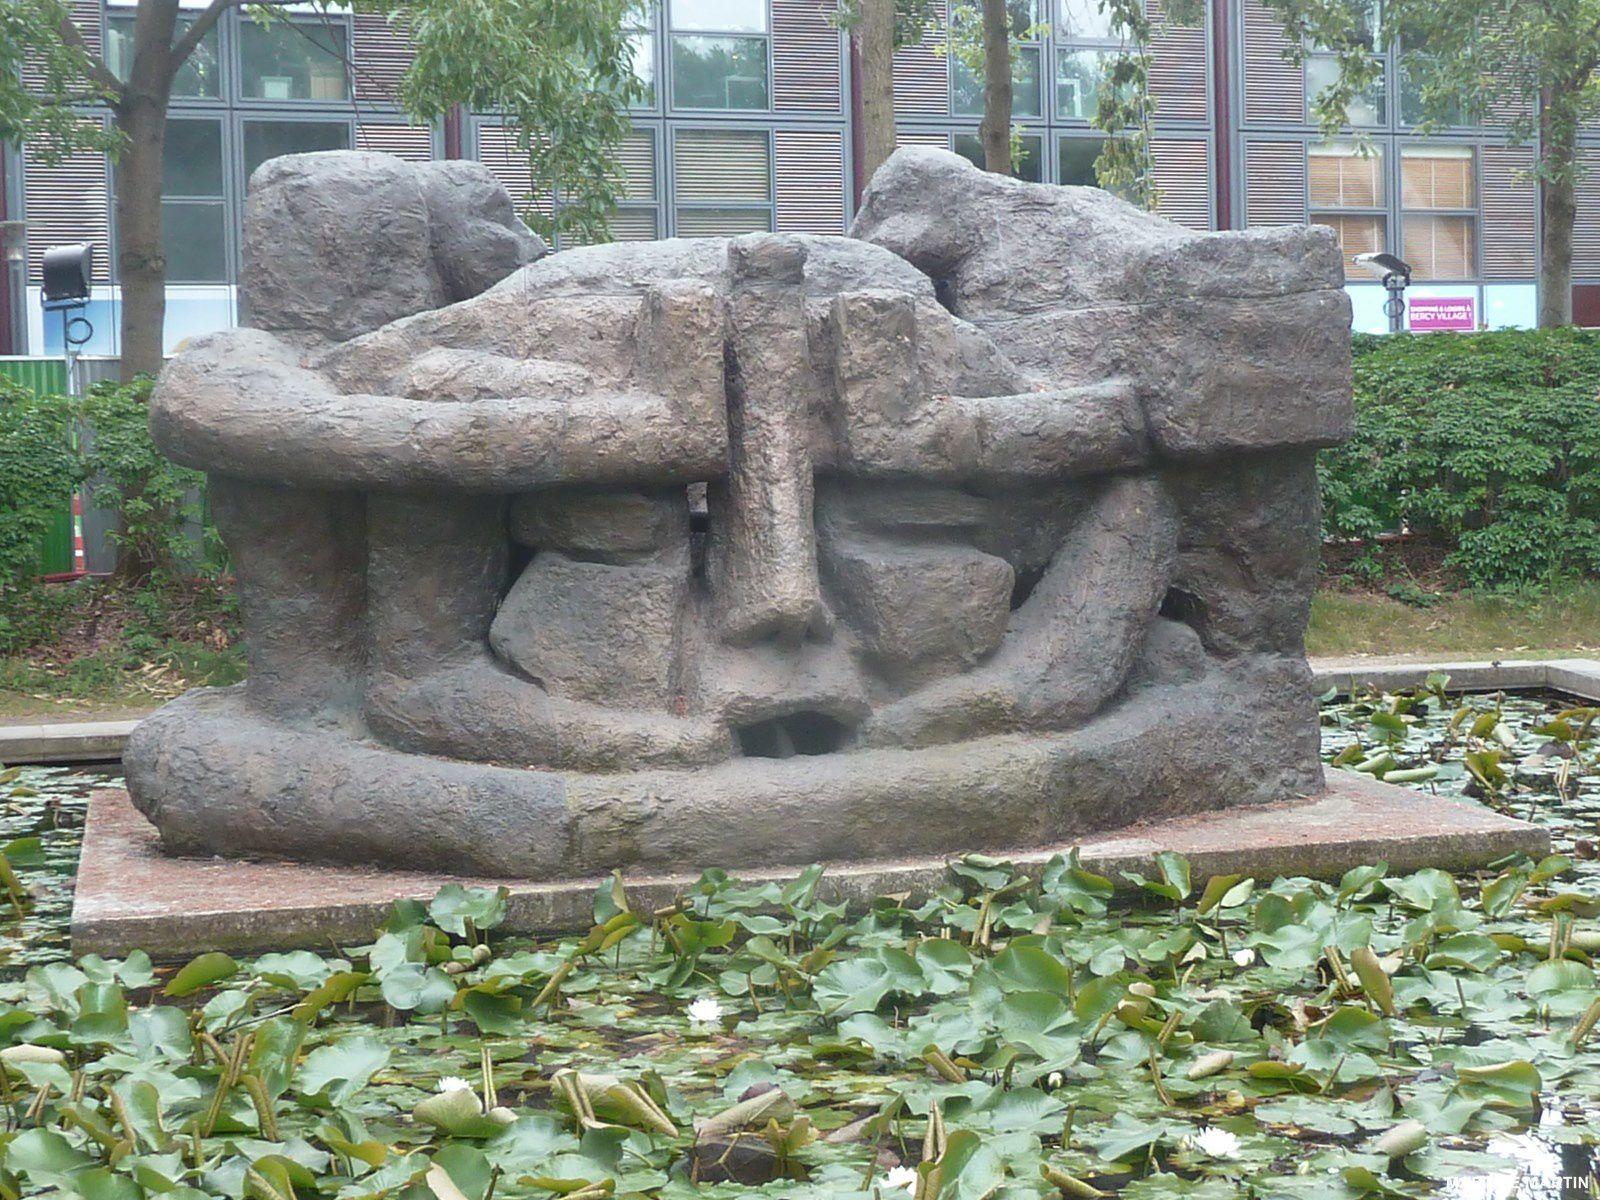 Le parc de bercy paris 12 me cergyrama for Jardin yitzhak rabin